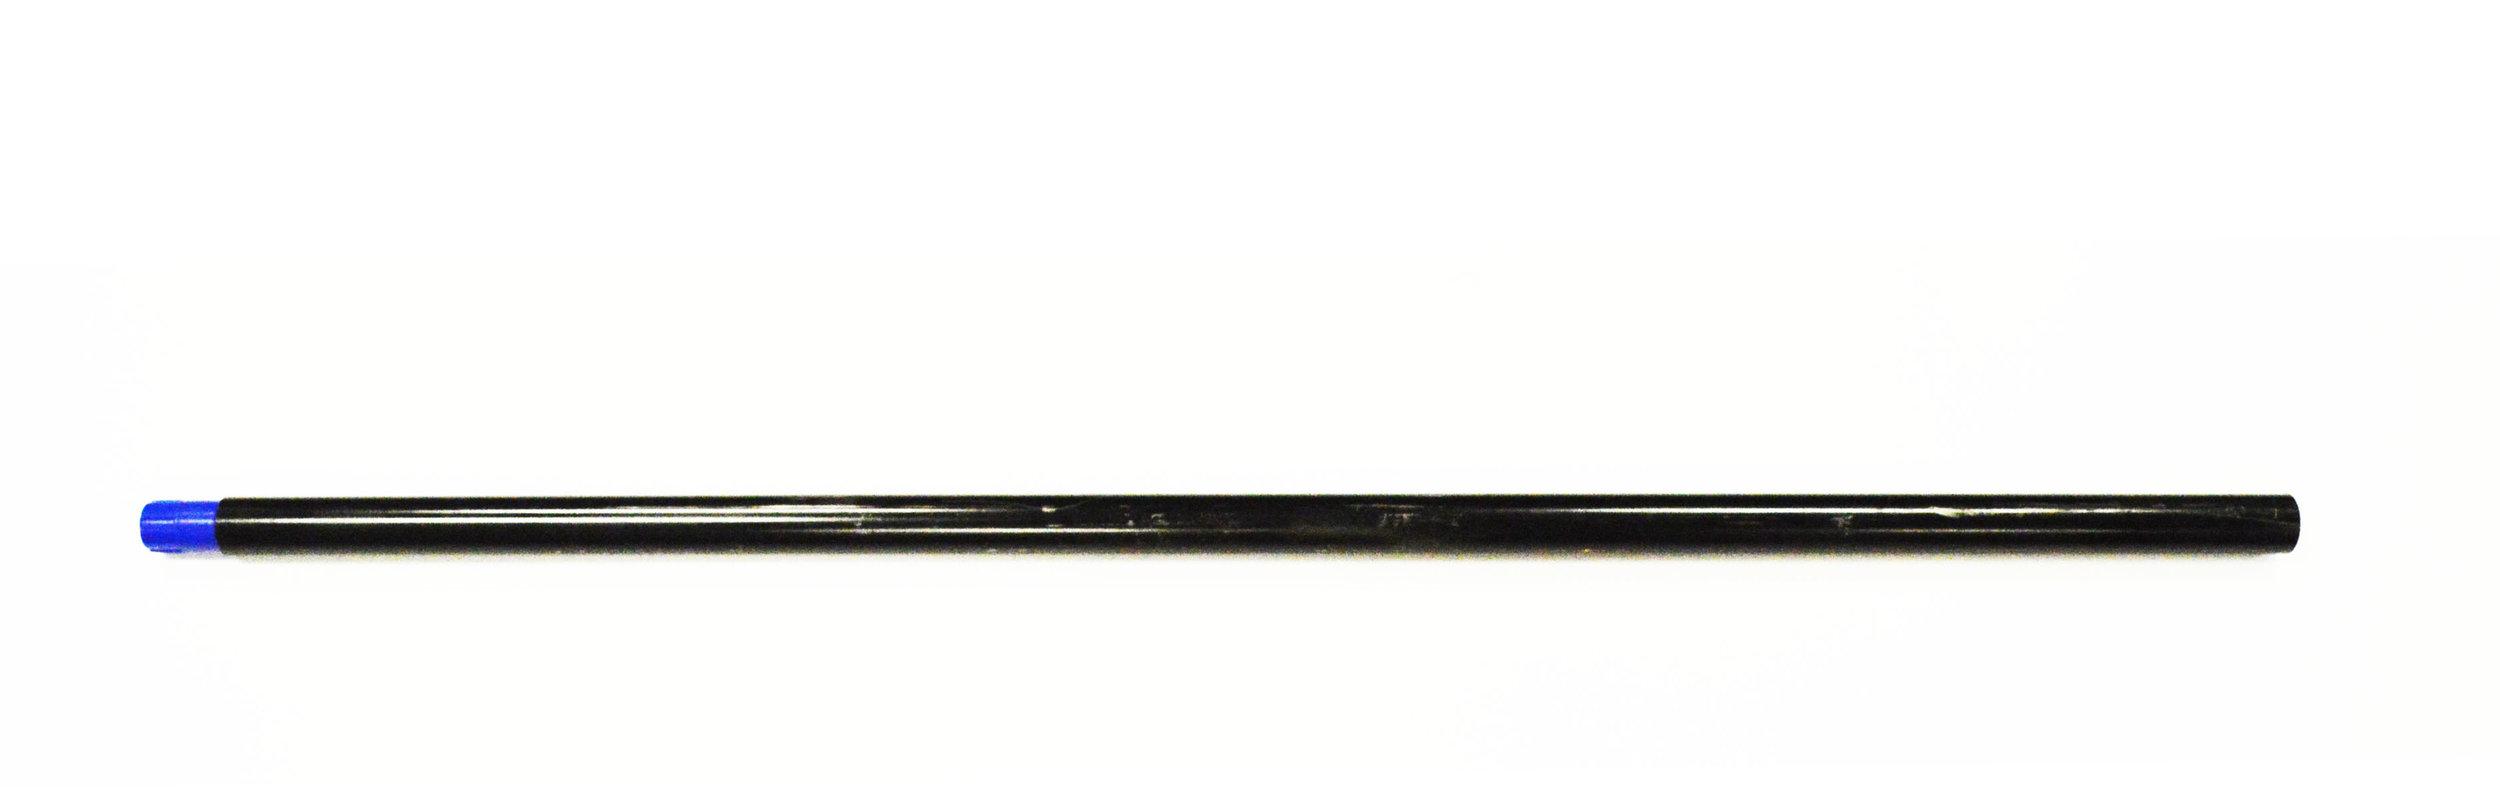 "5' Steel Weight Bar       1-1/4""-8 UN Threads           SMS-5003"